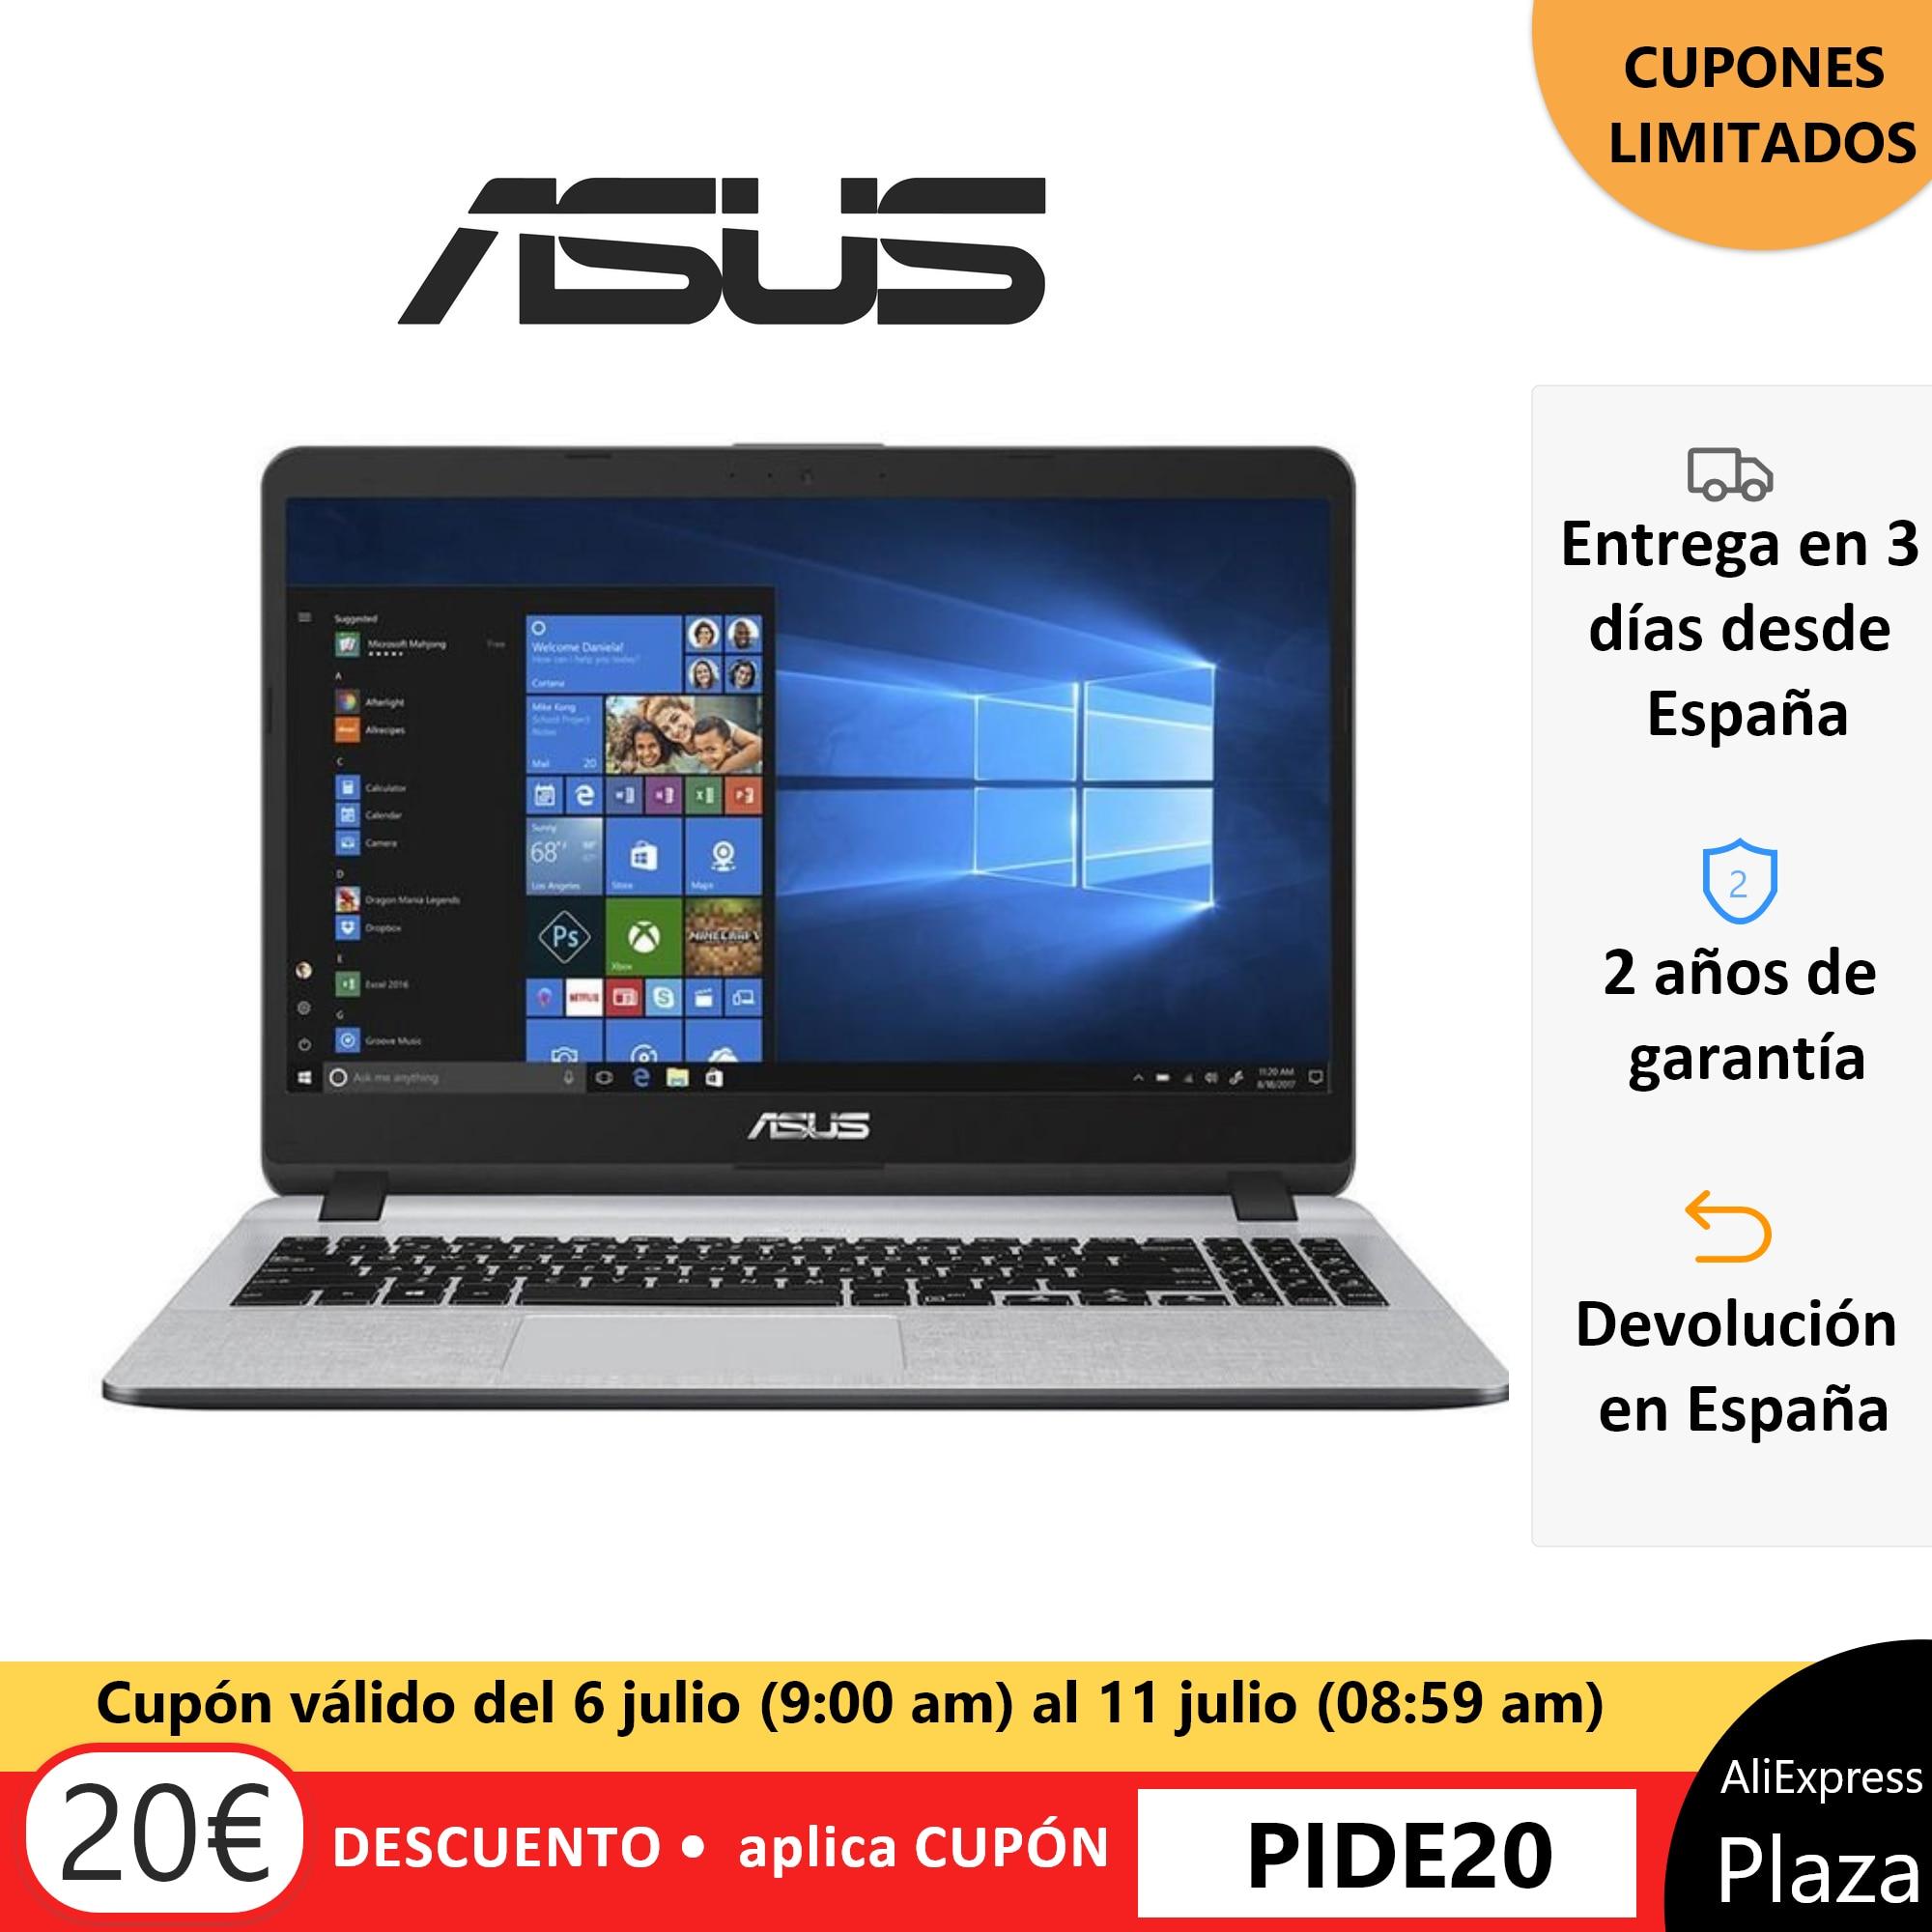 Laptop ASUS Laptop X507MA-BR418T, ORIGINAL, Old 2 Warranty, Square Spain, W10 Home, Intel Celeron N4000